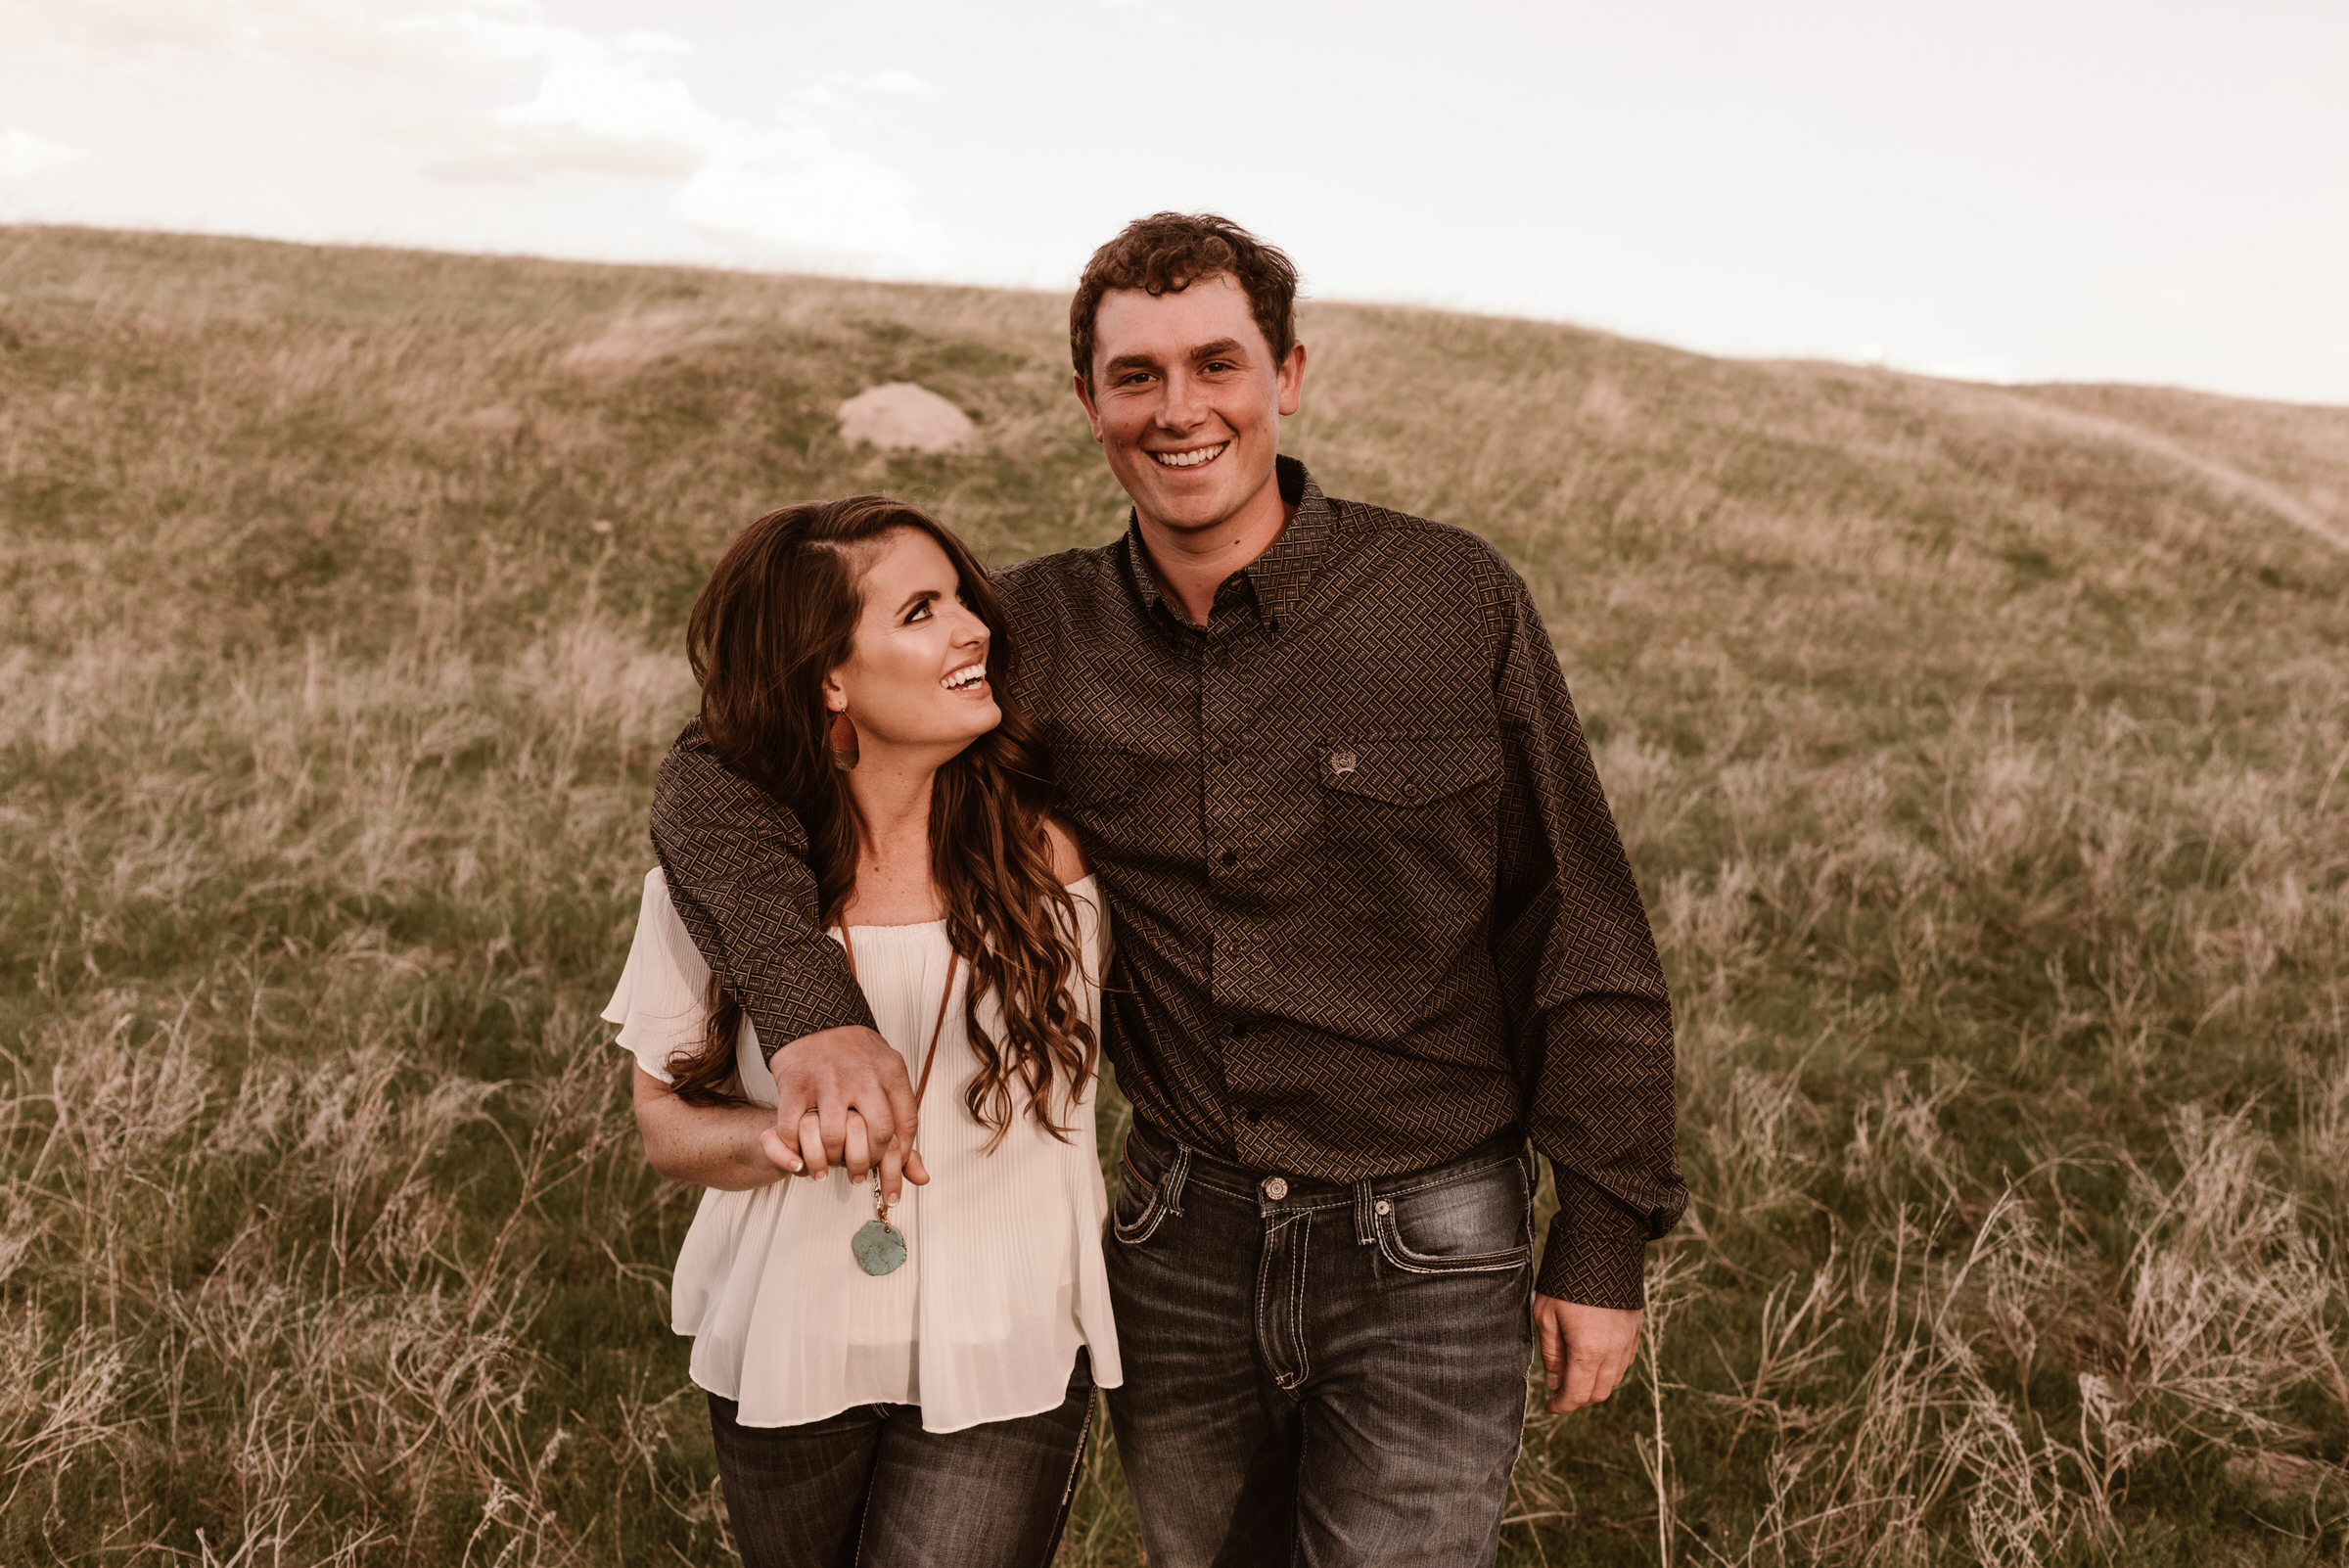 Sandhills-Nebraska-Engagement-Wedding-Photographer-Kaylie-Sirek-Photography-003.jpg